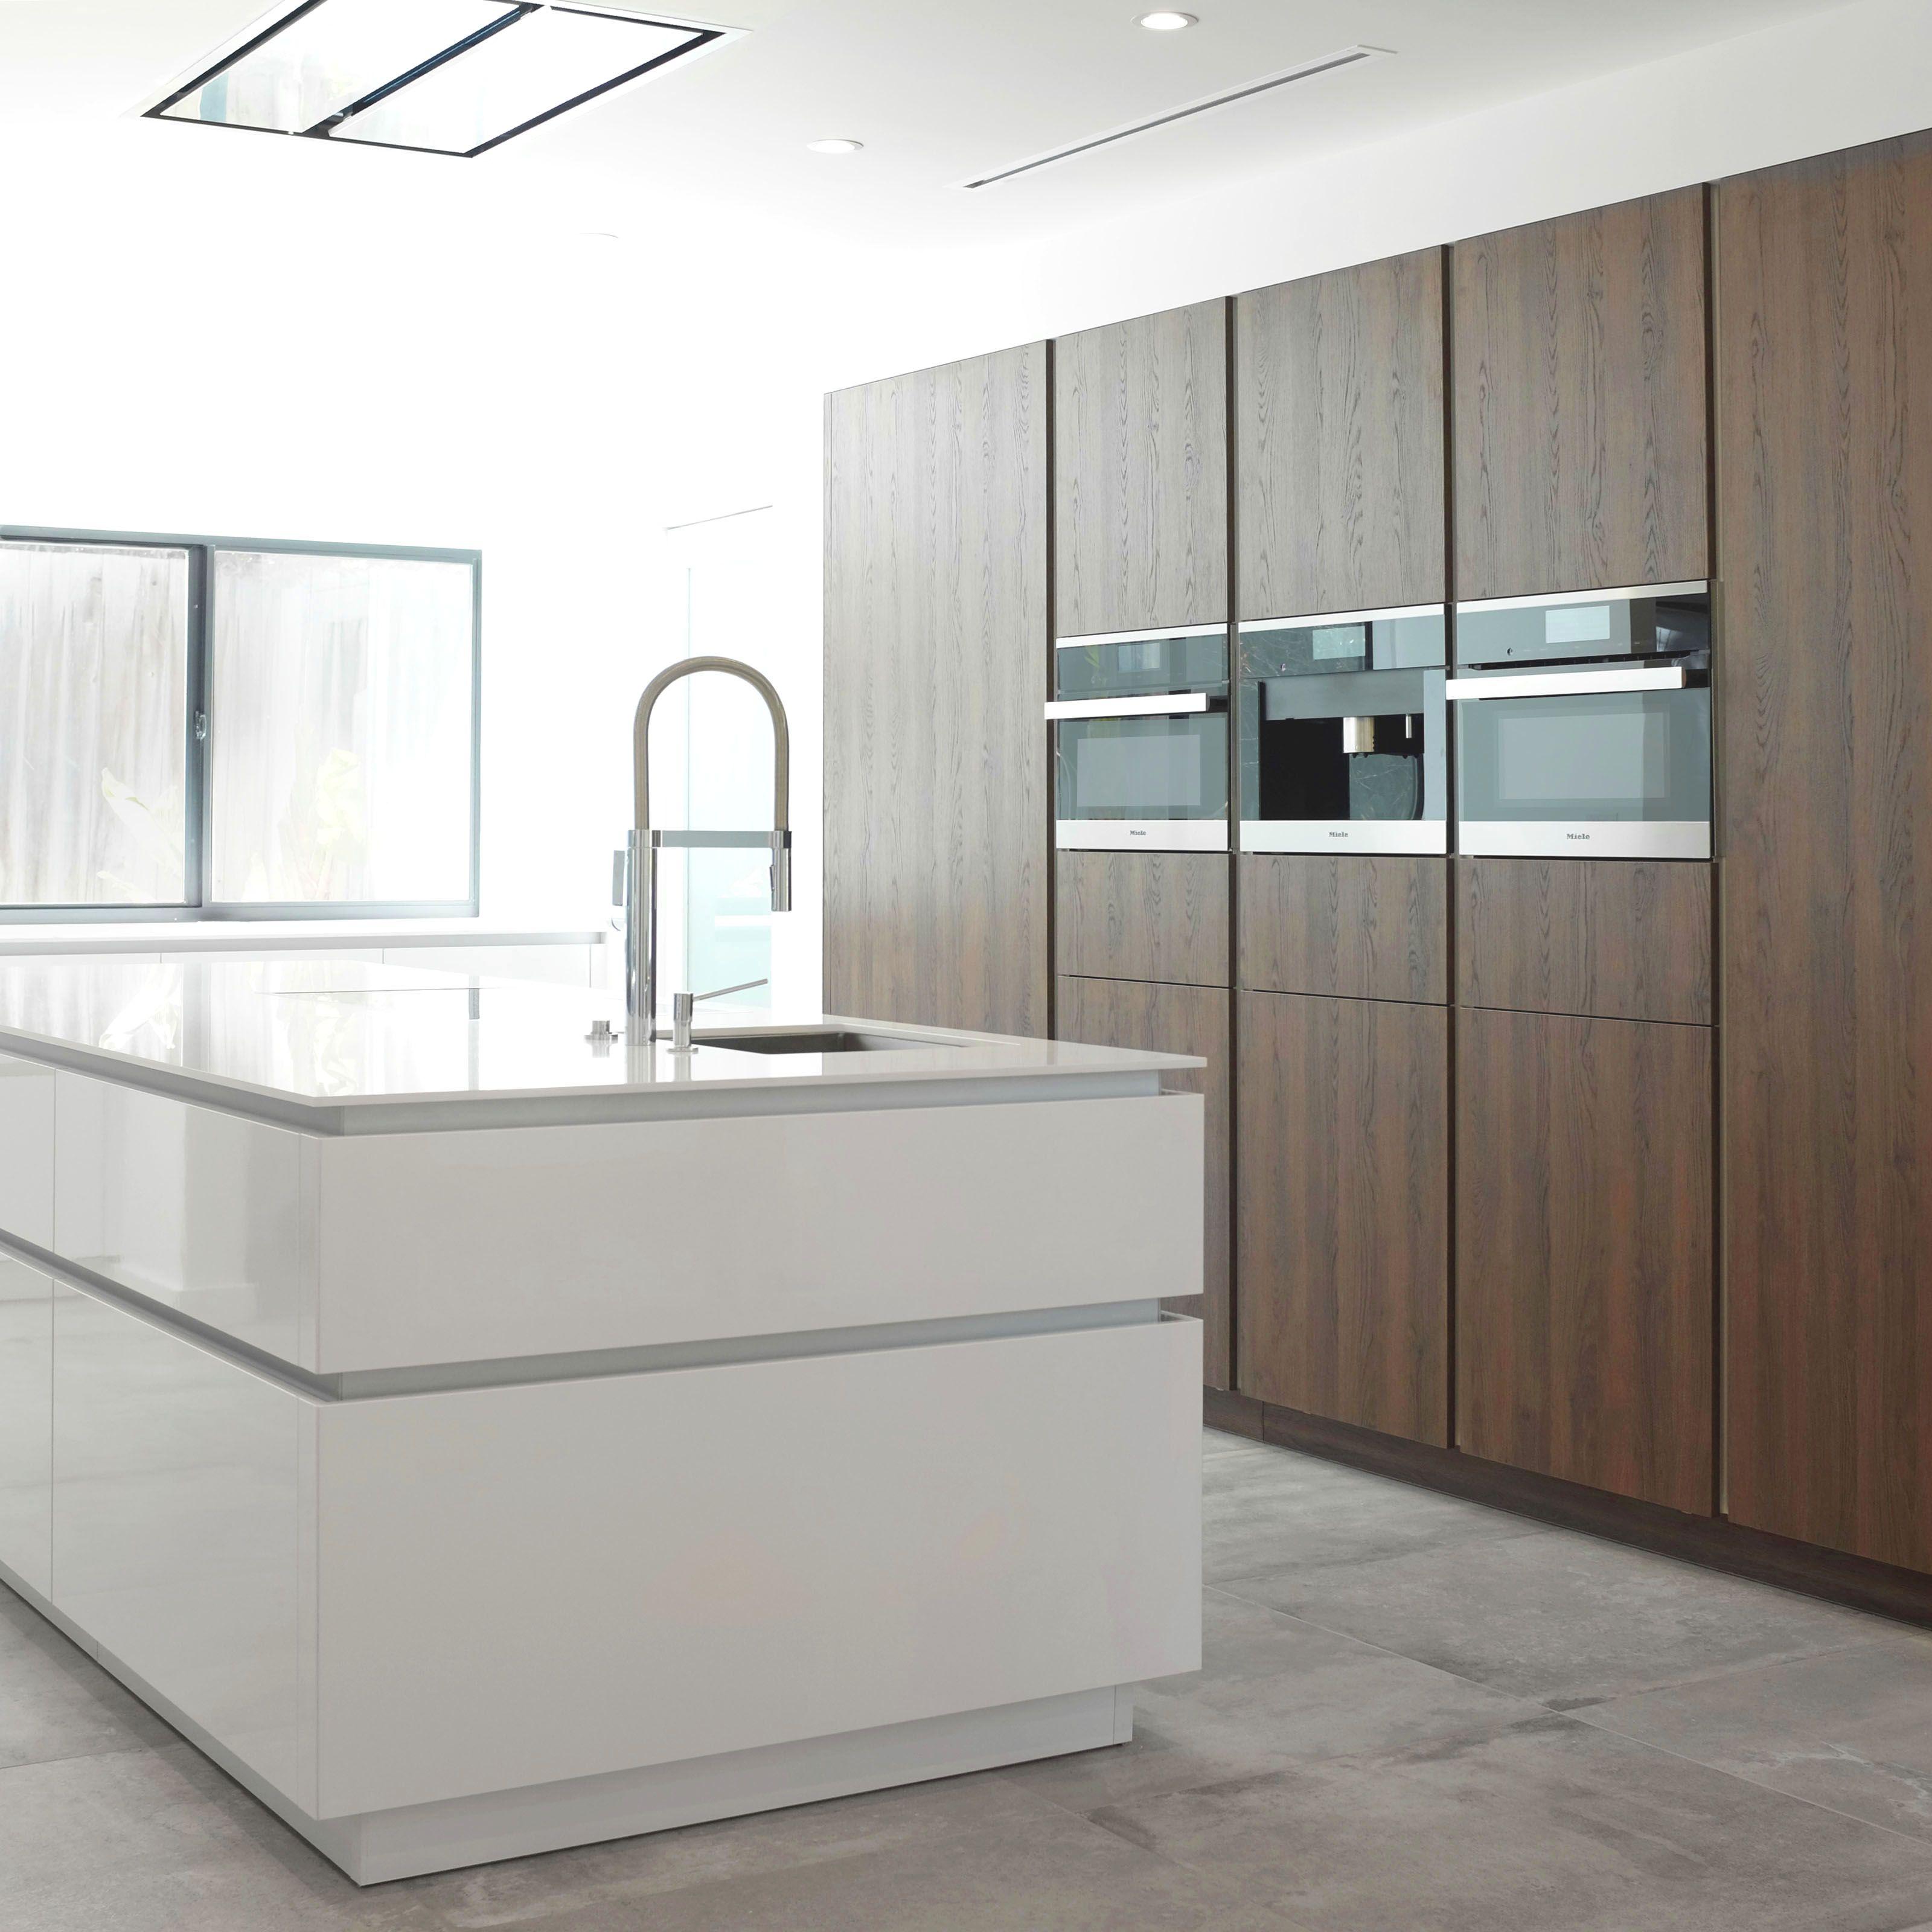 Wildhagen strakke moderne keuken met houten kasten wand en greeploos kookeiland - Kleden houten wand ...